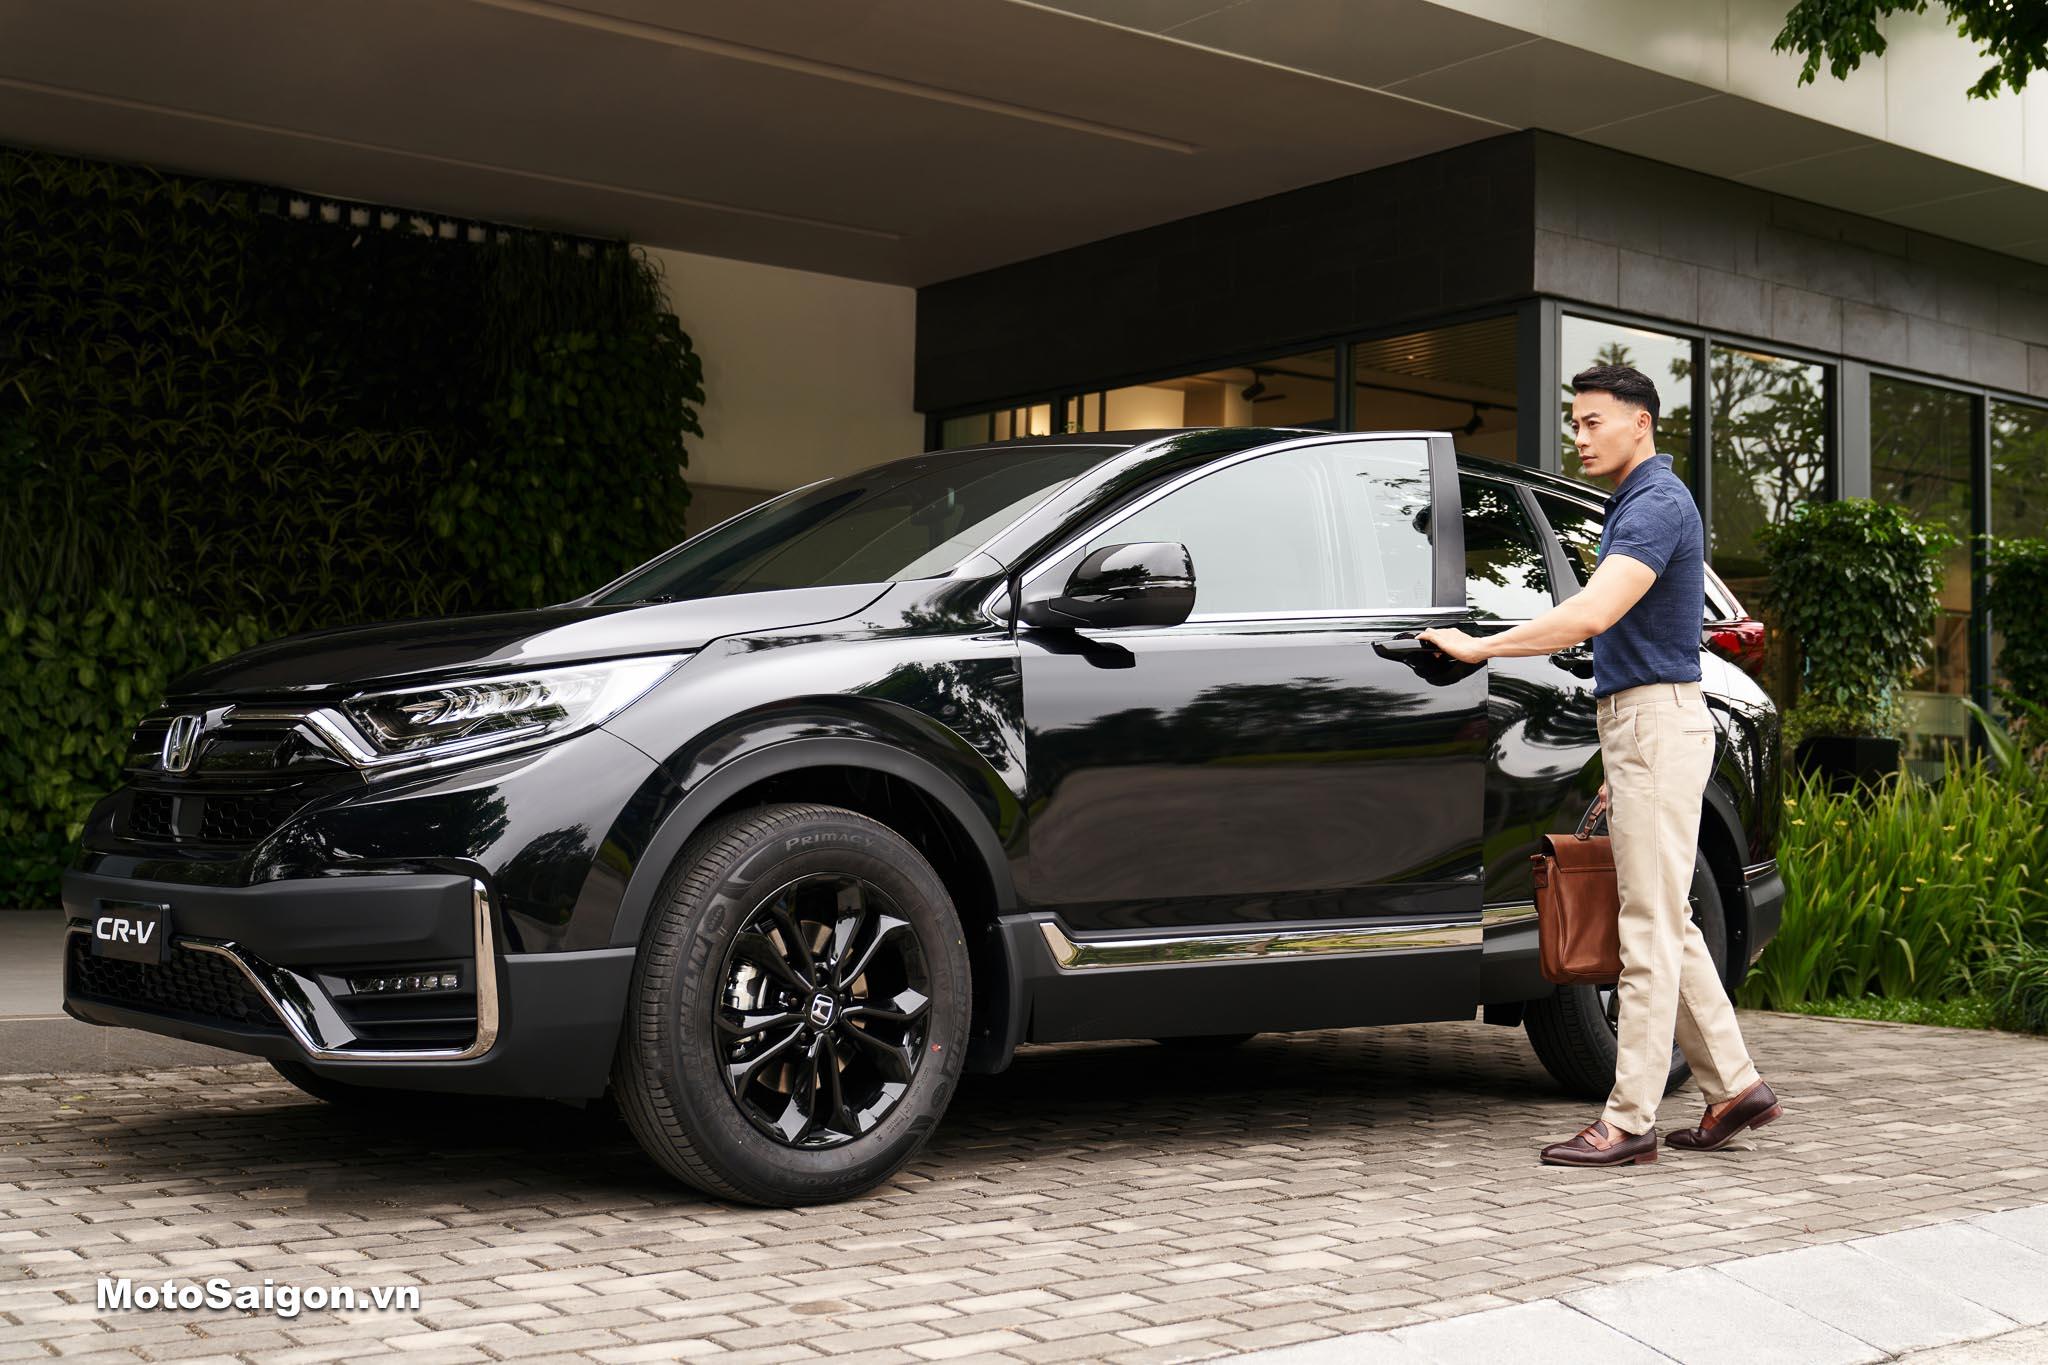 Phiên bản đặc biệt Honda CR-V LSE